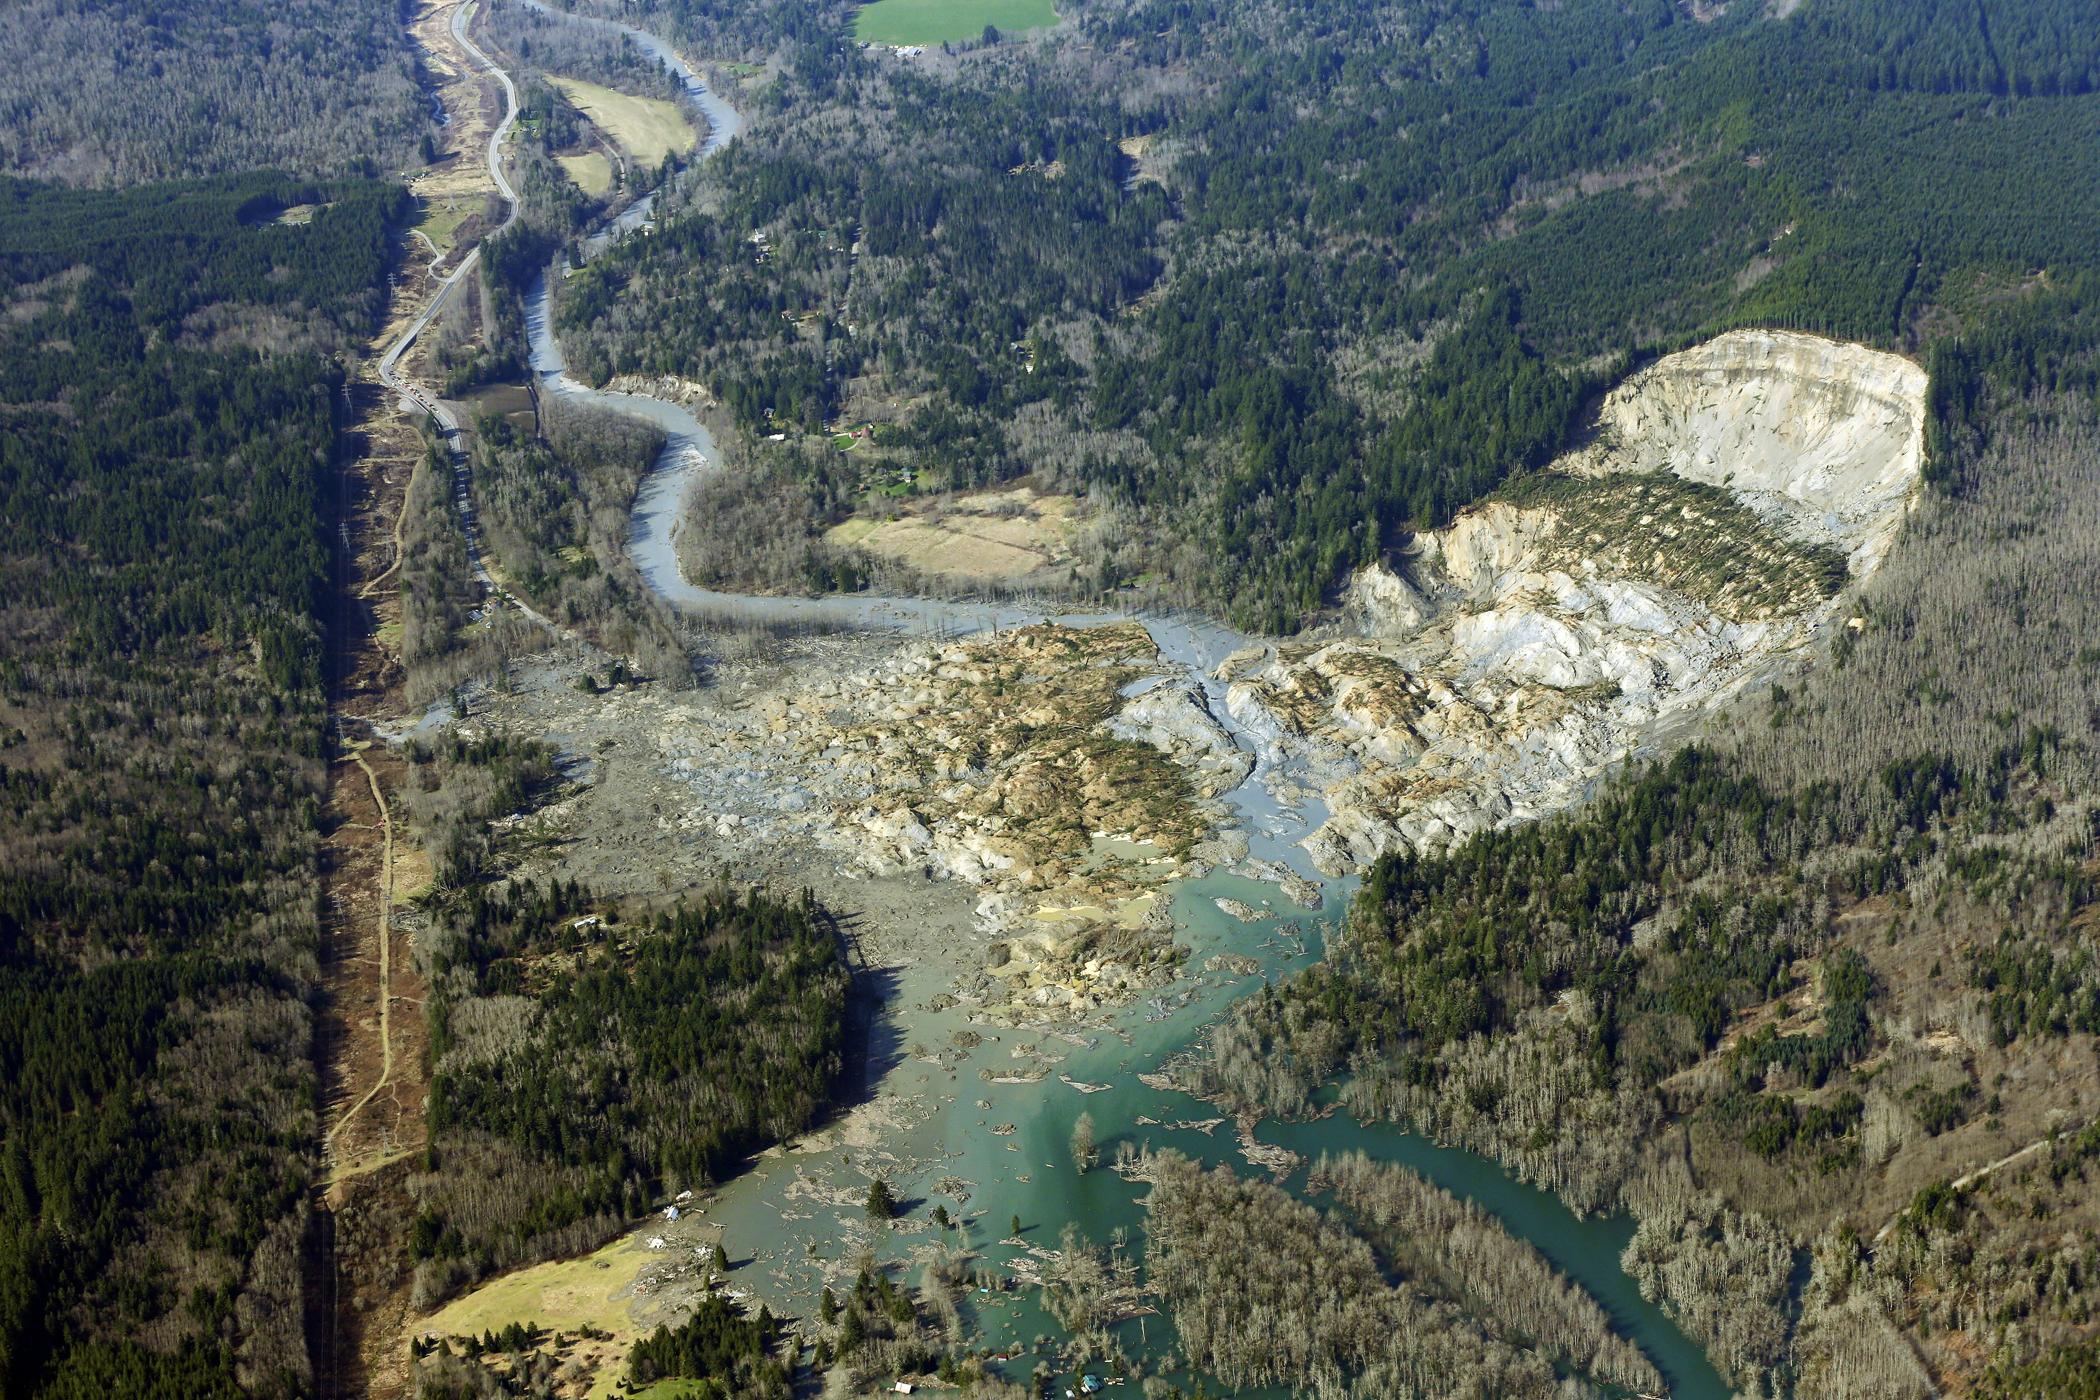 Aerial photo shows the massive mudslide near Arlington, Wash., March 24, 2014.